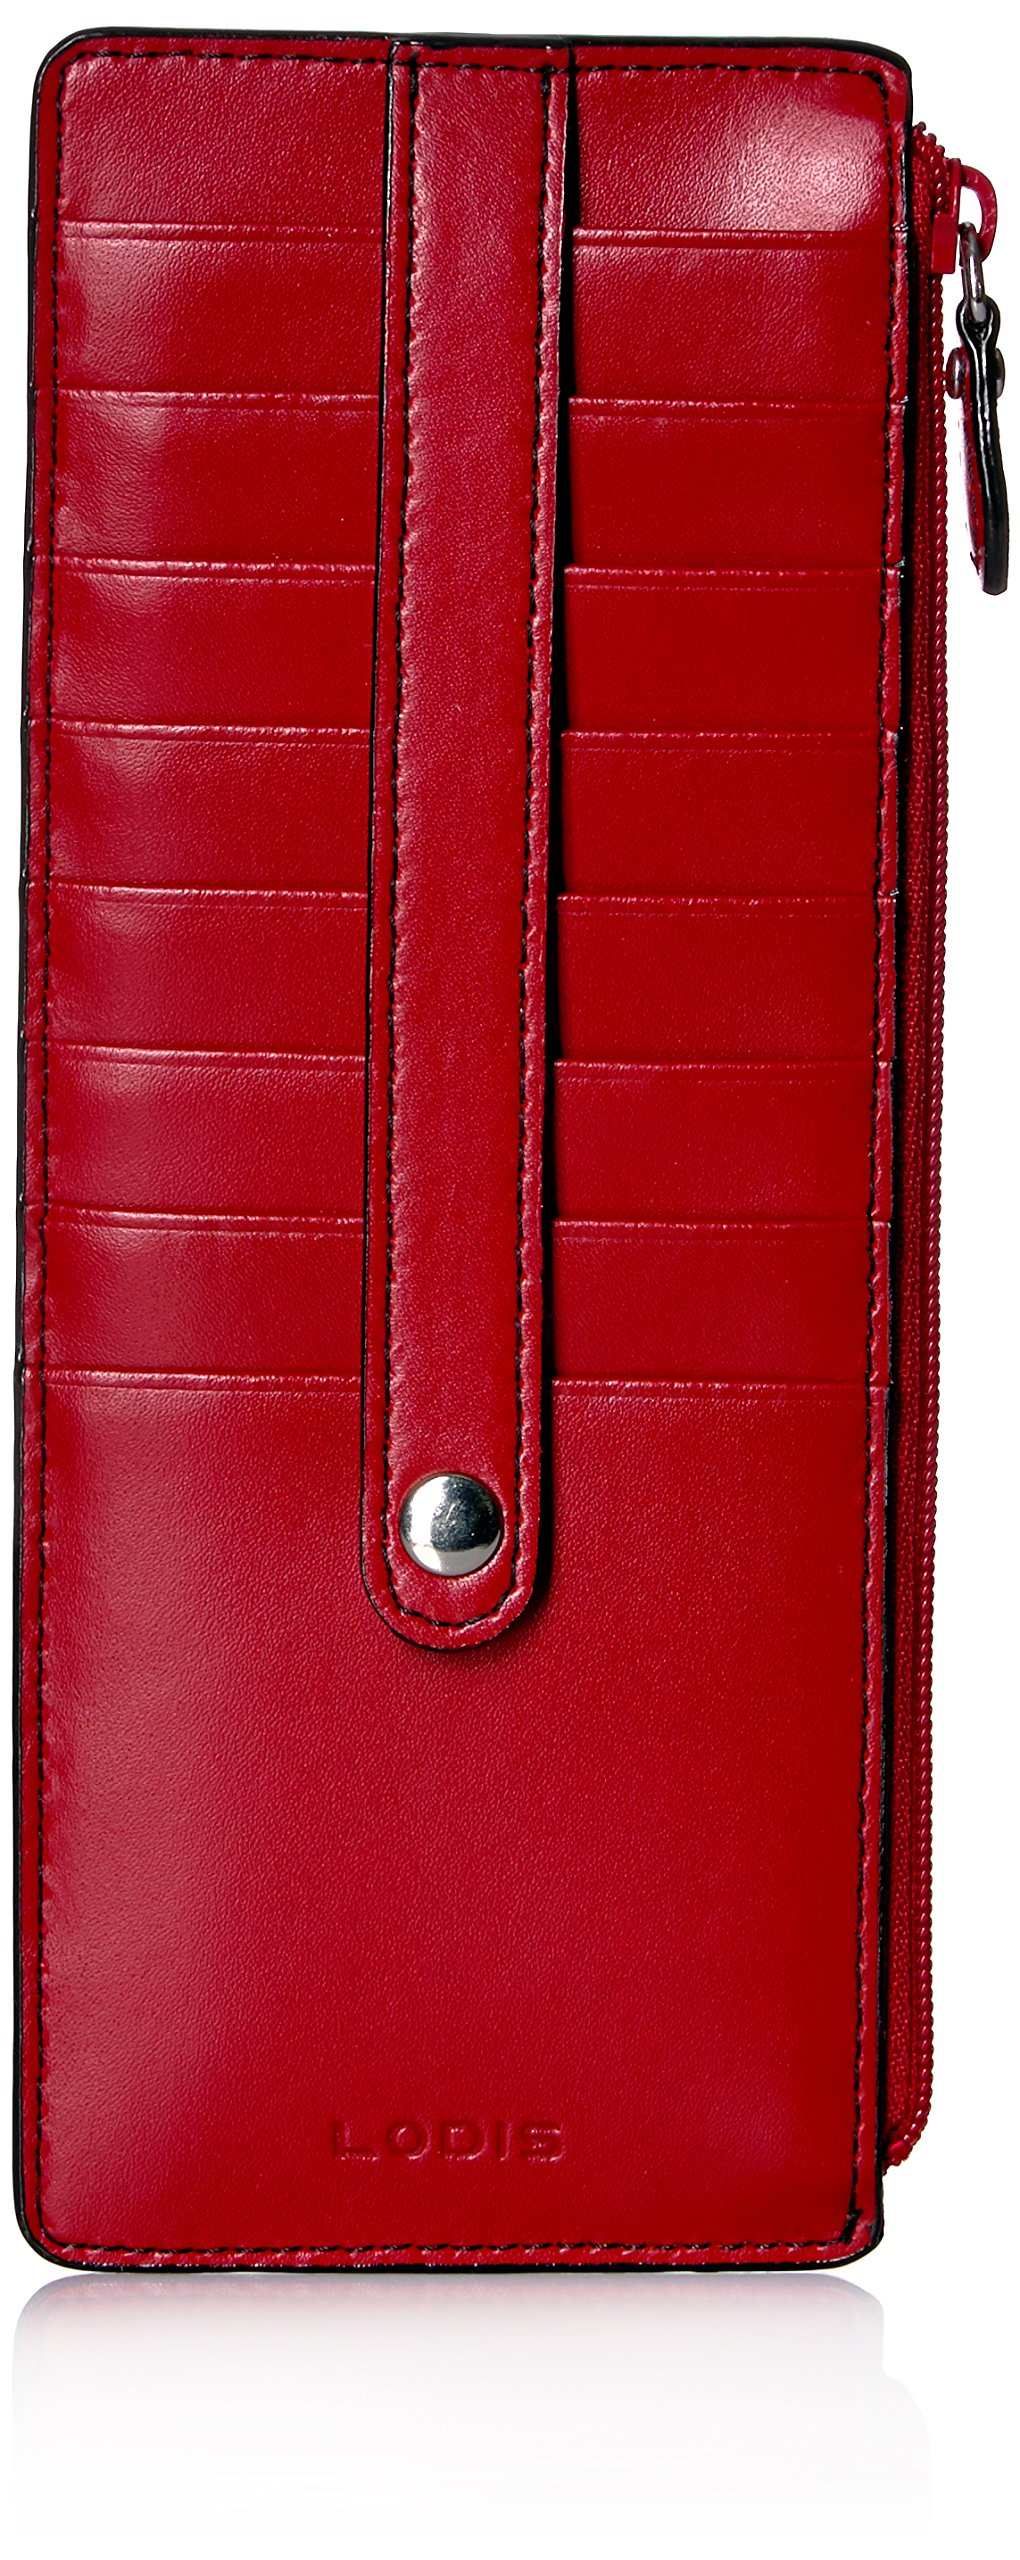 LODIS - Lodis Audrey RFID Credit Card Case with Zipper Pocket (Red) - Walmart.com